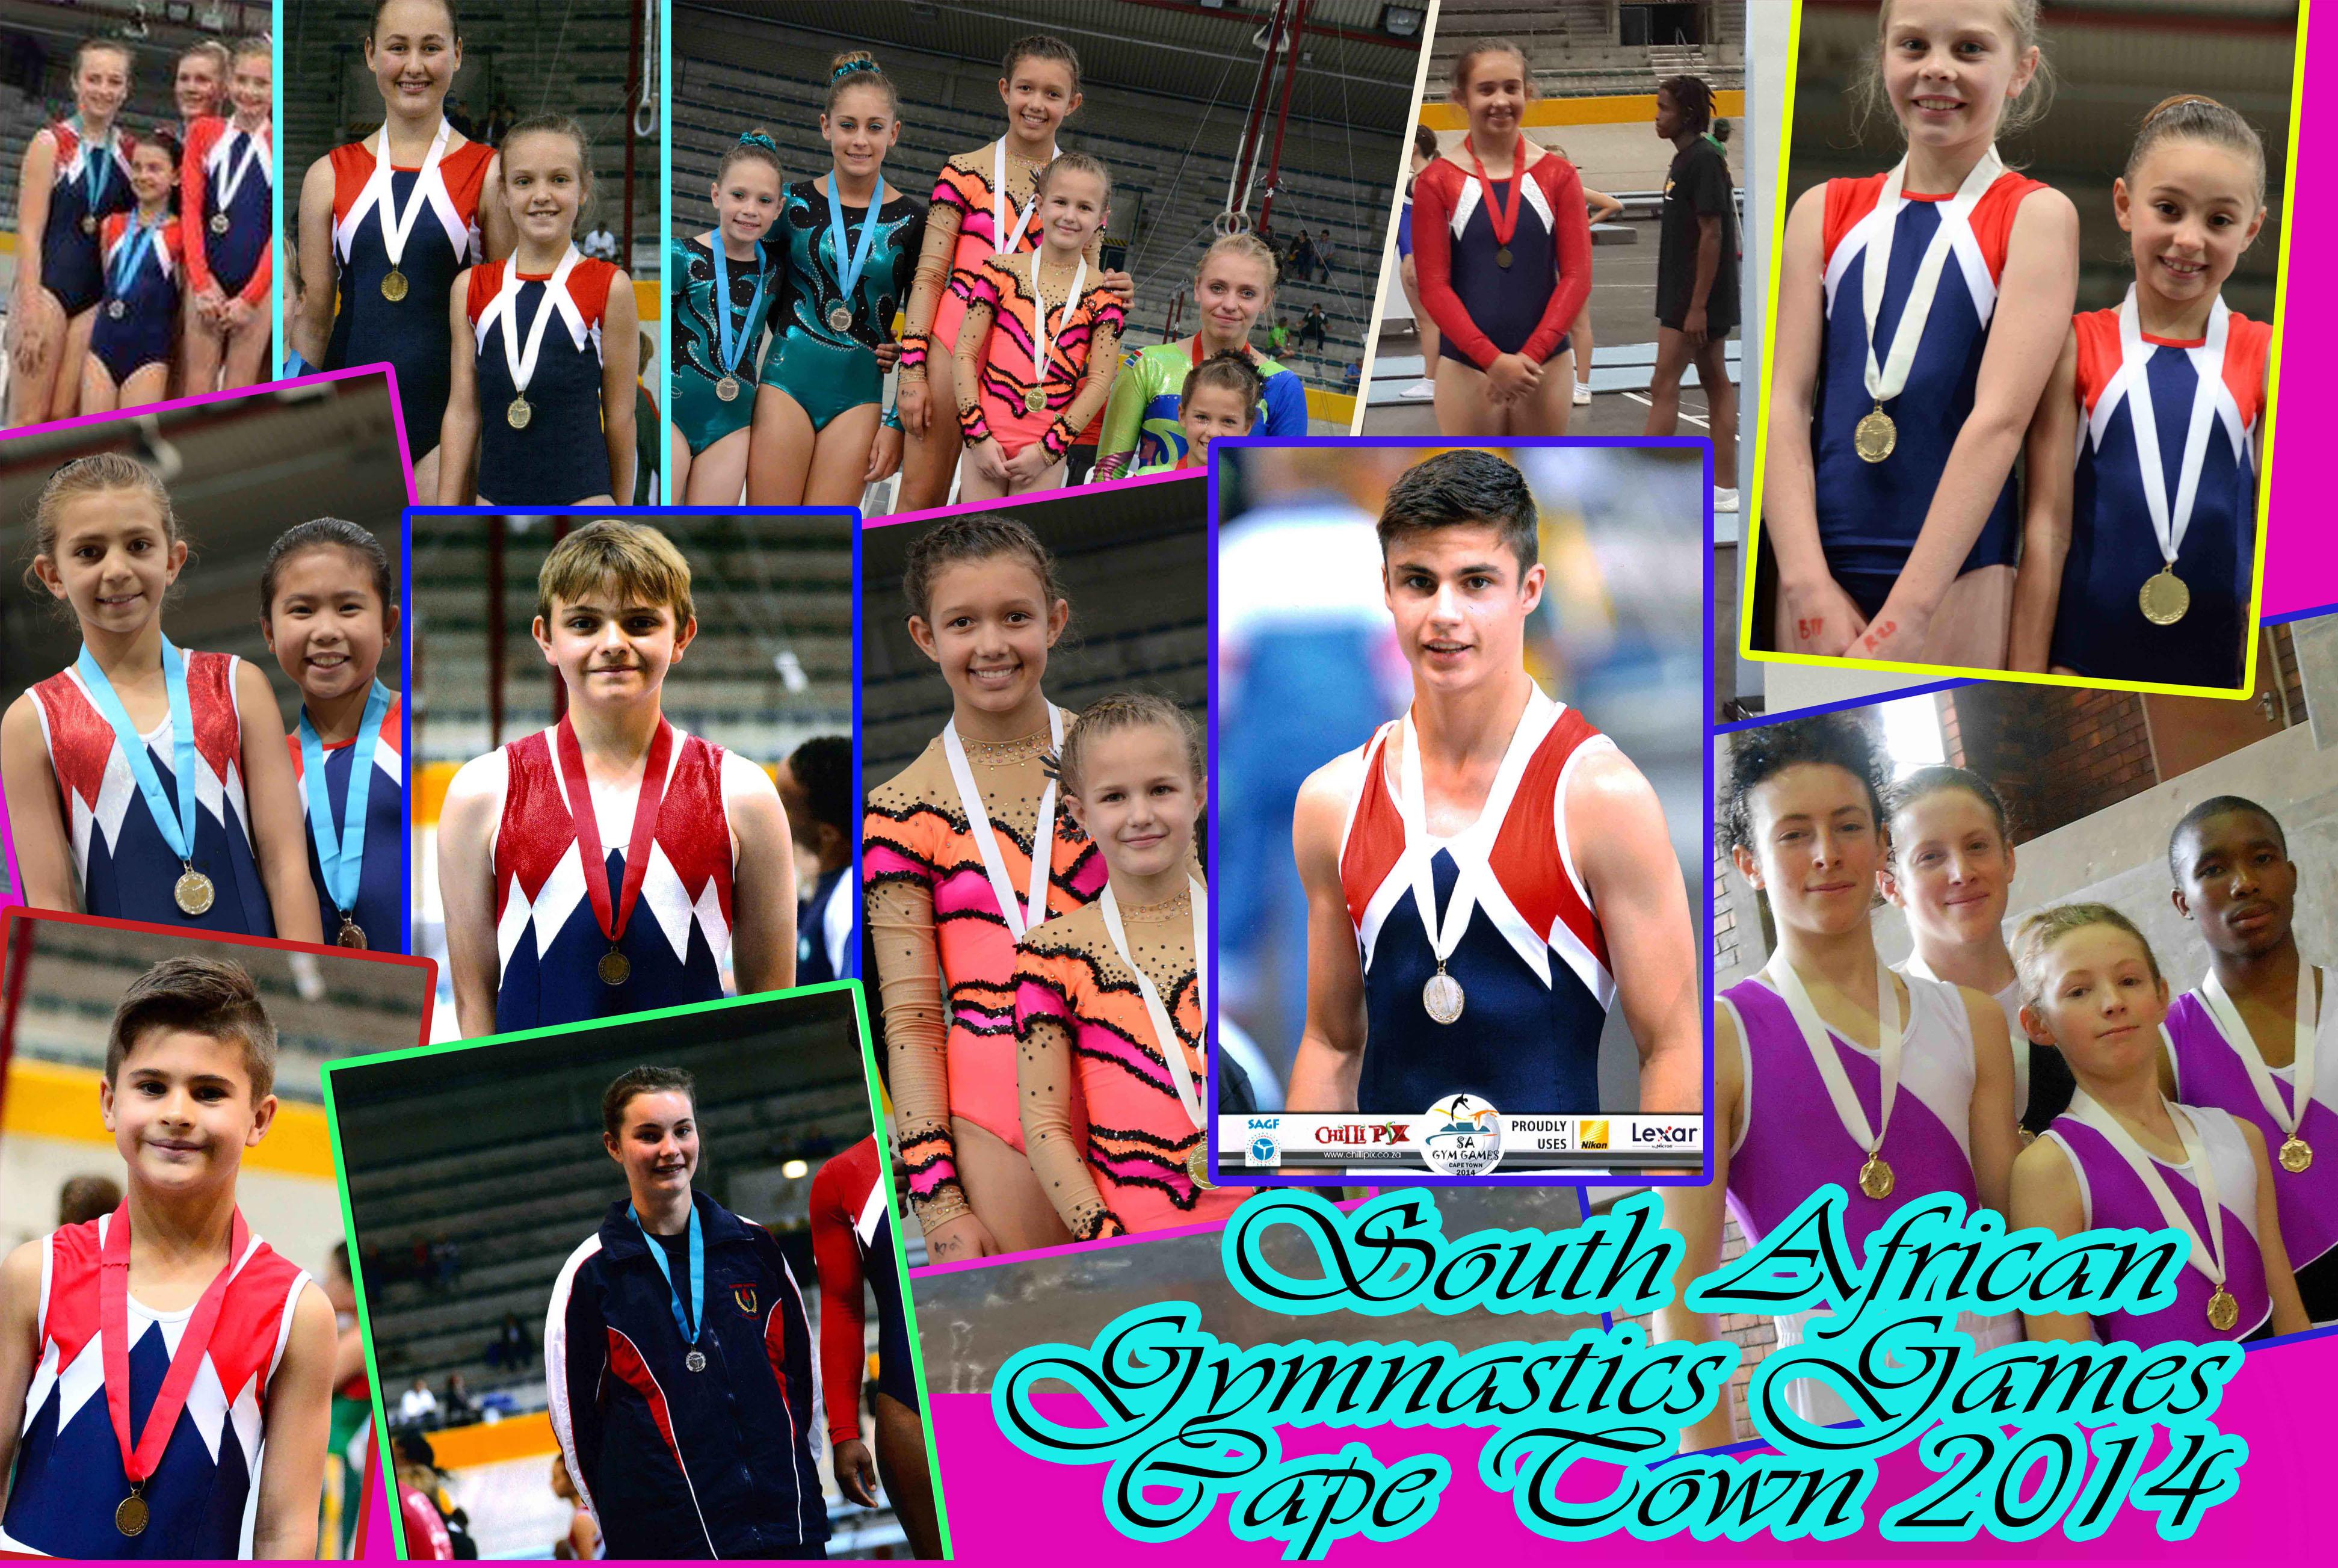 SA Gymnastics Games Success for Gymnasts